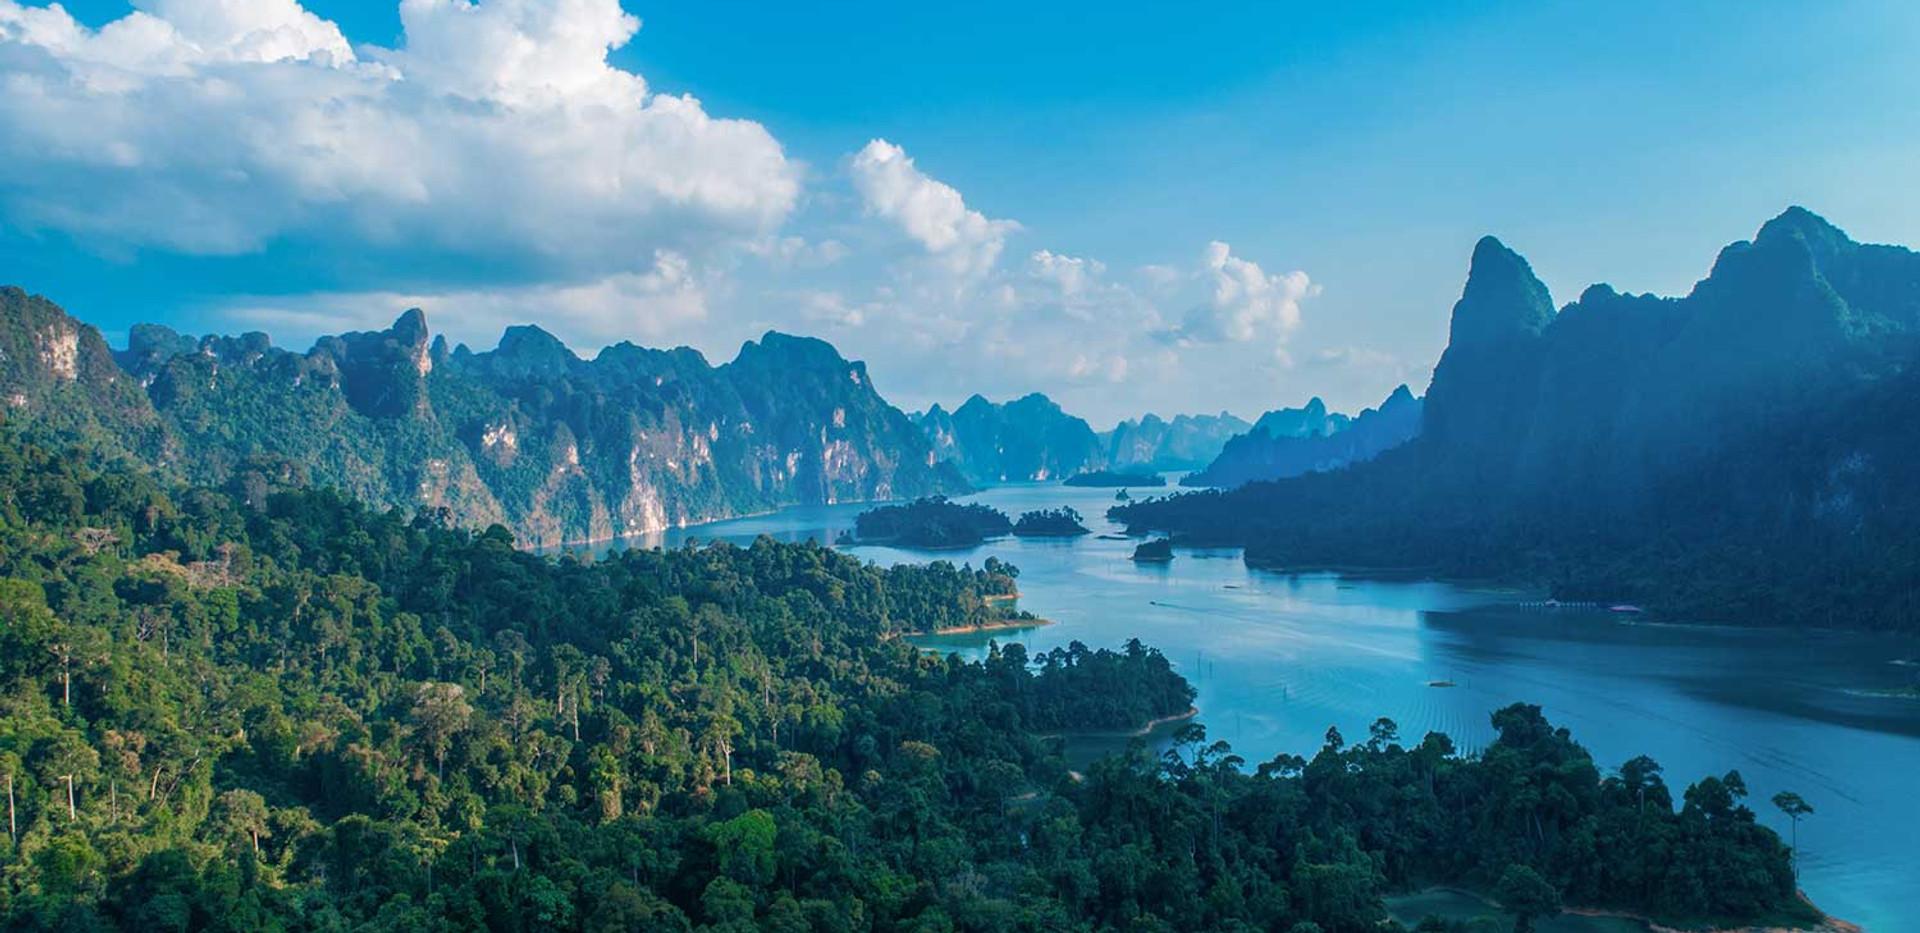 Thailand Yoga Holidays Destination Emerald Lake Video